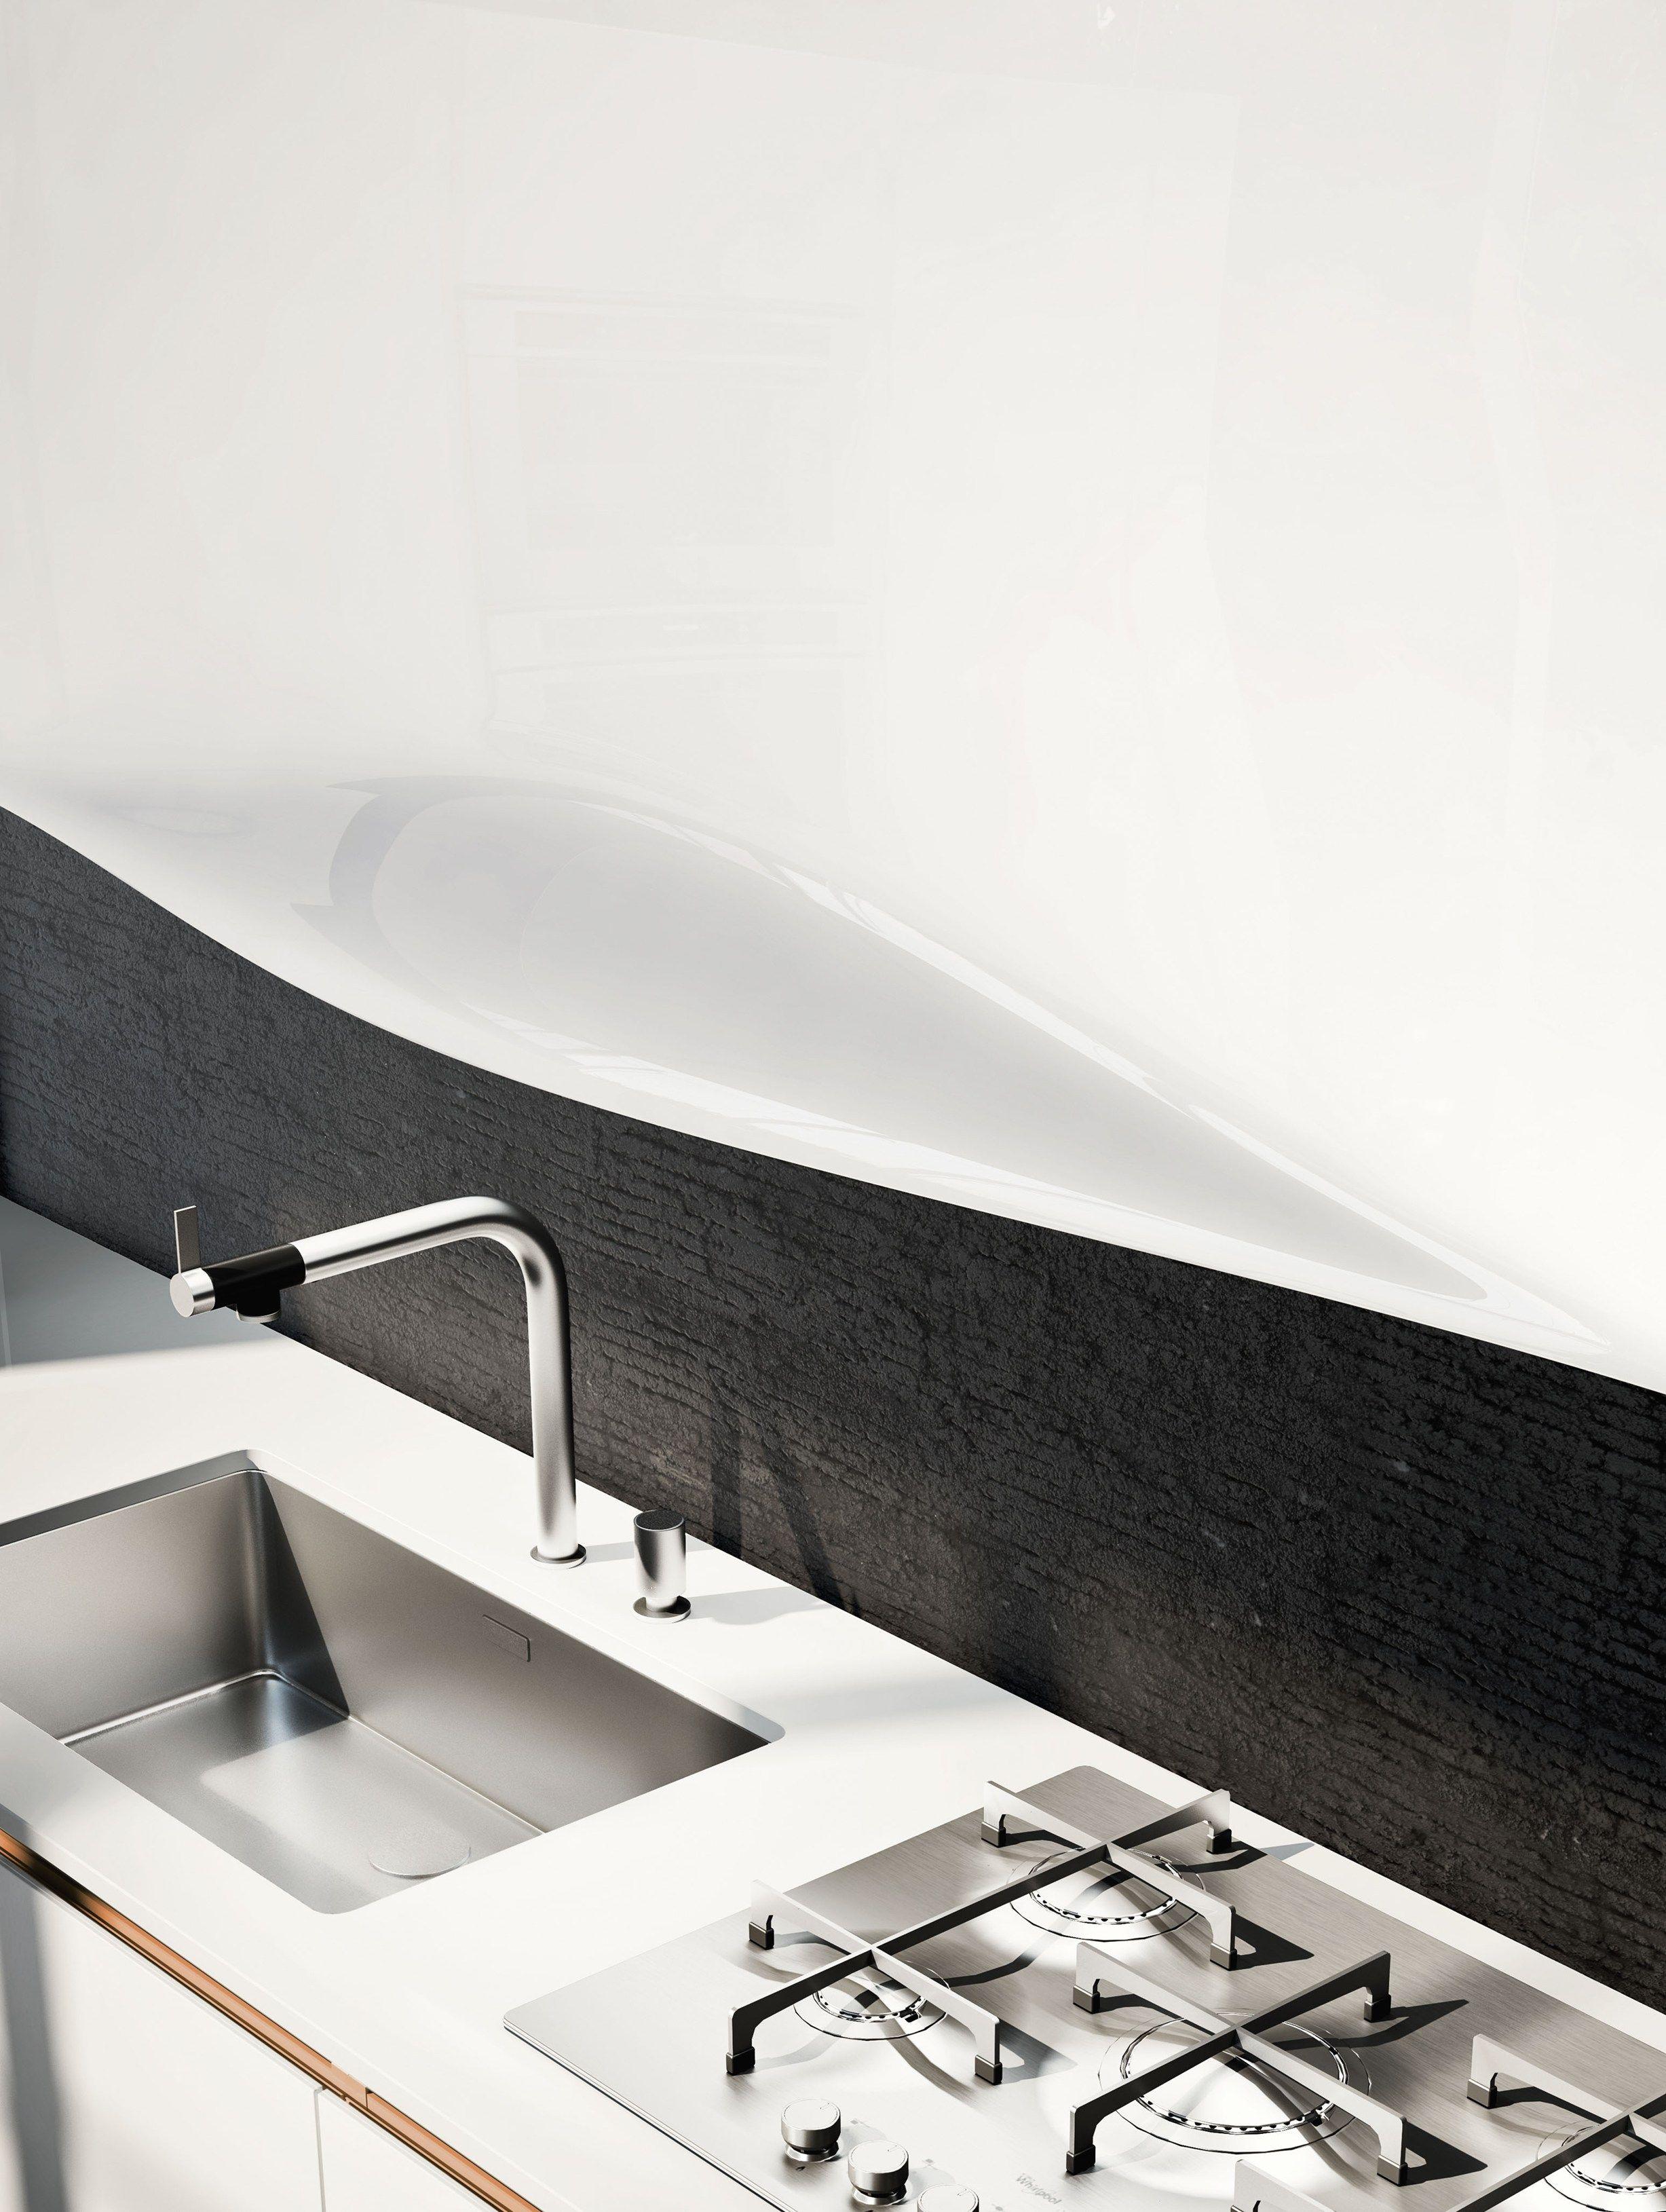 Schön OLA 25   Küche Mit Halbinsel Kollektion ICONE By Snaidero Design  Pininfarina